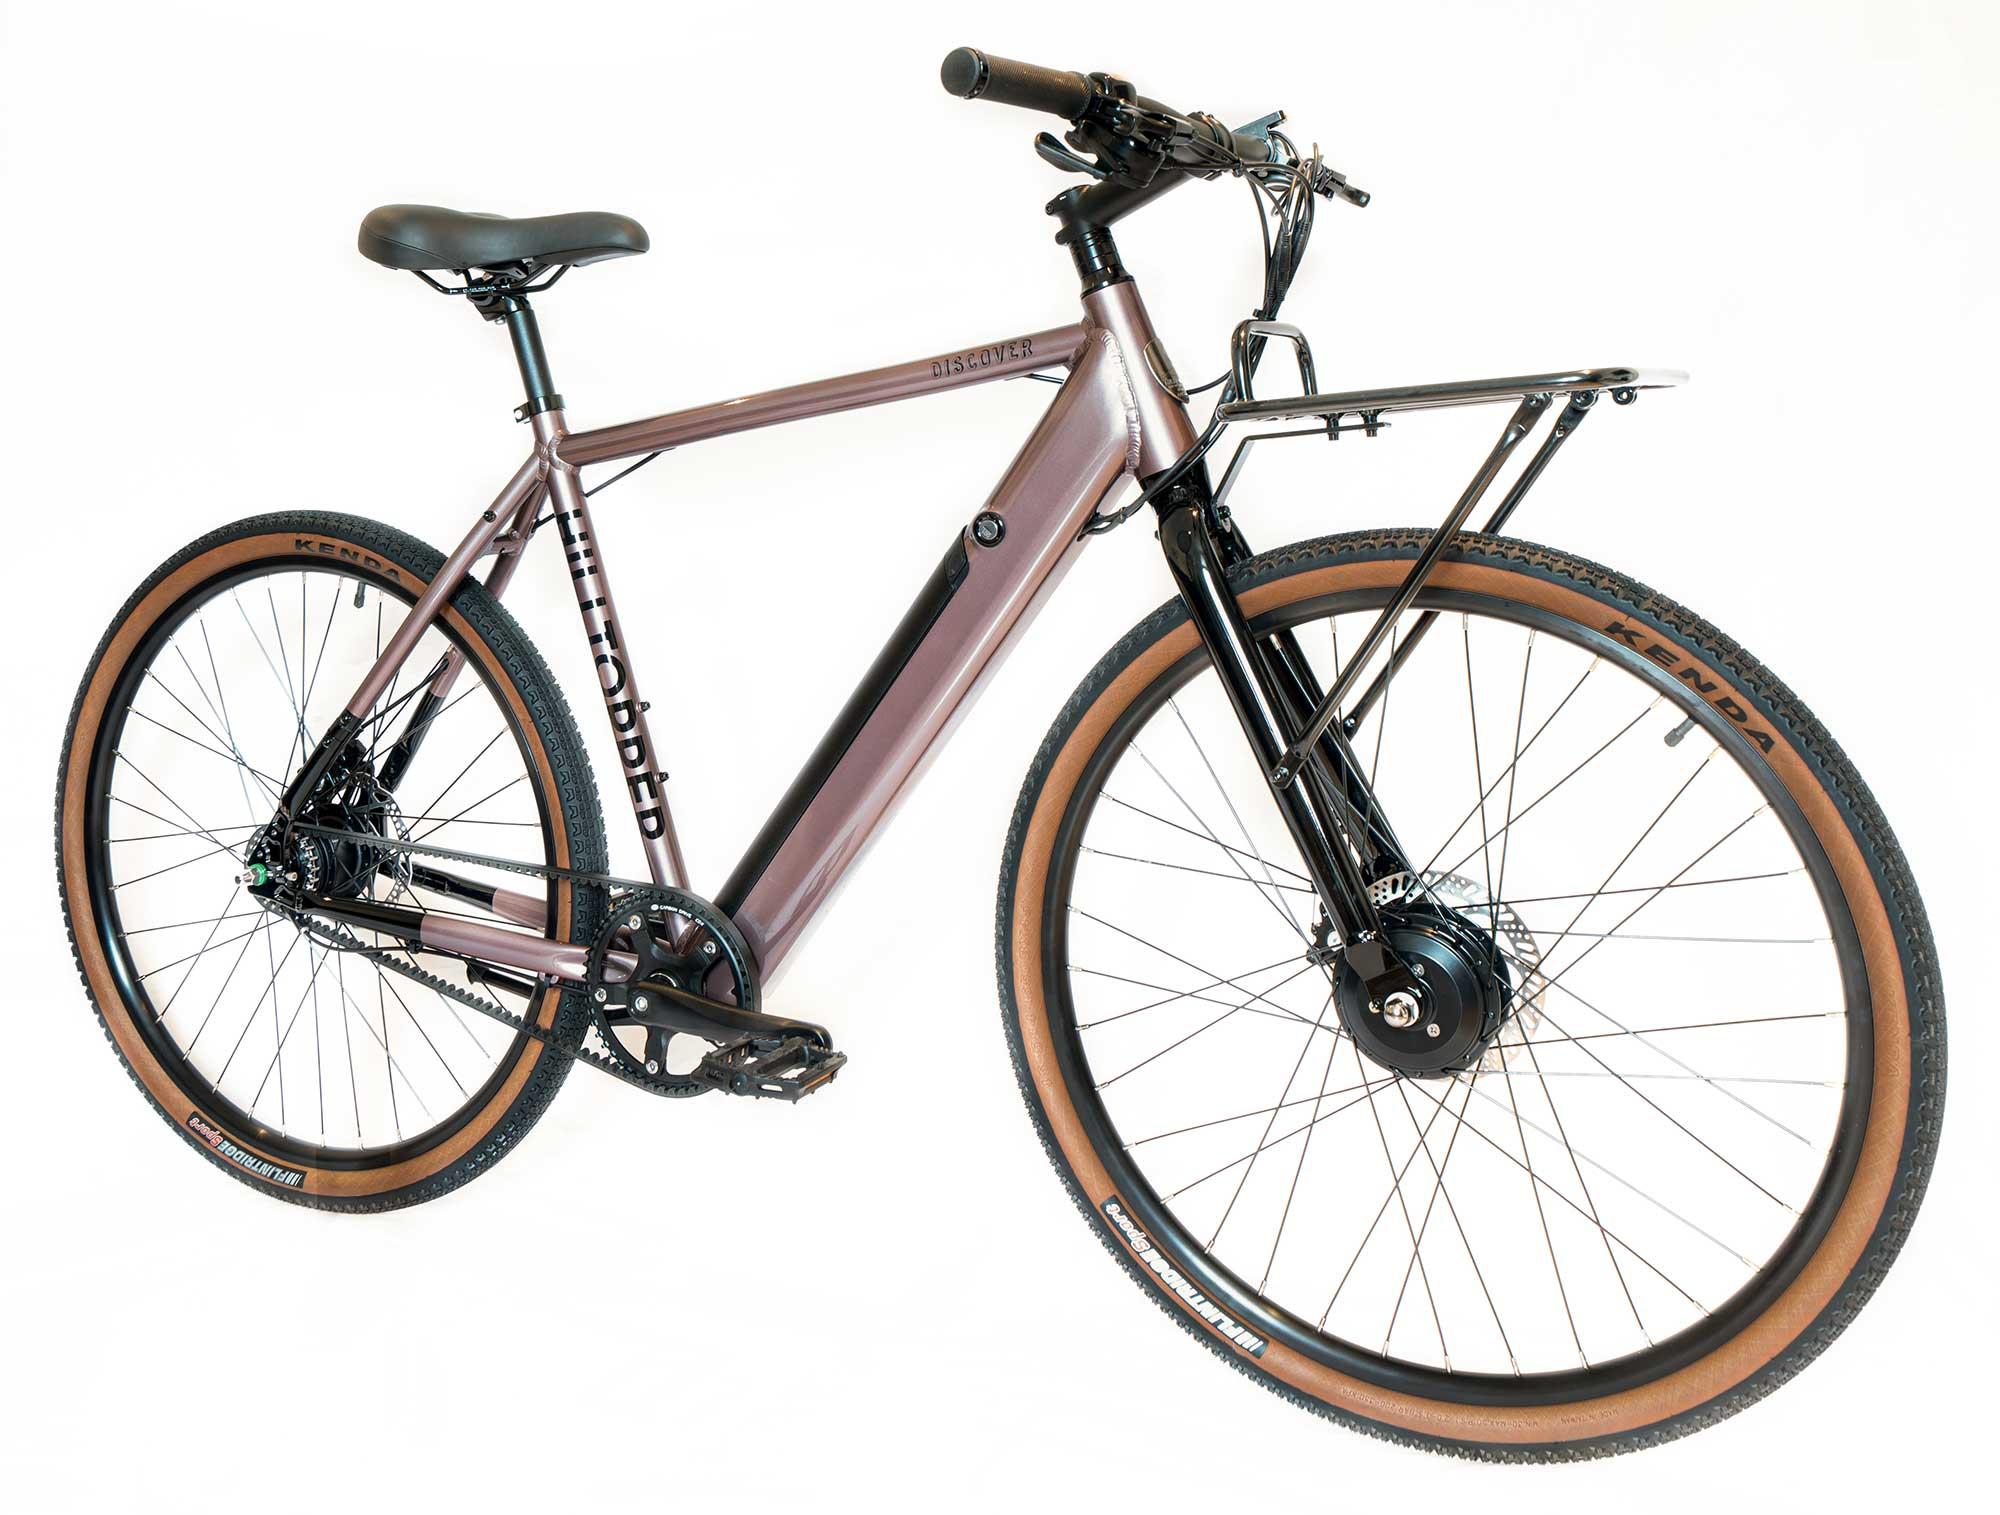 Hilltopper Discover LE Electric Gravel Road Bike